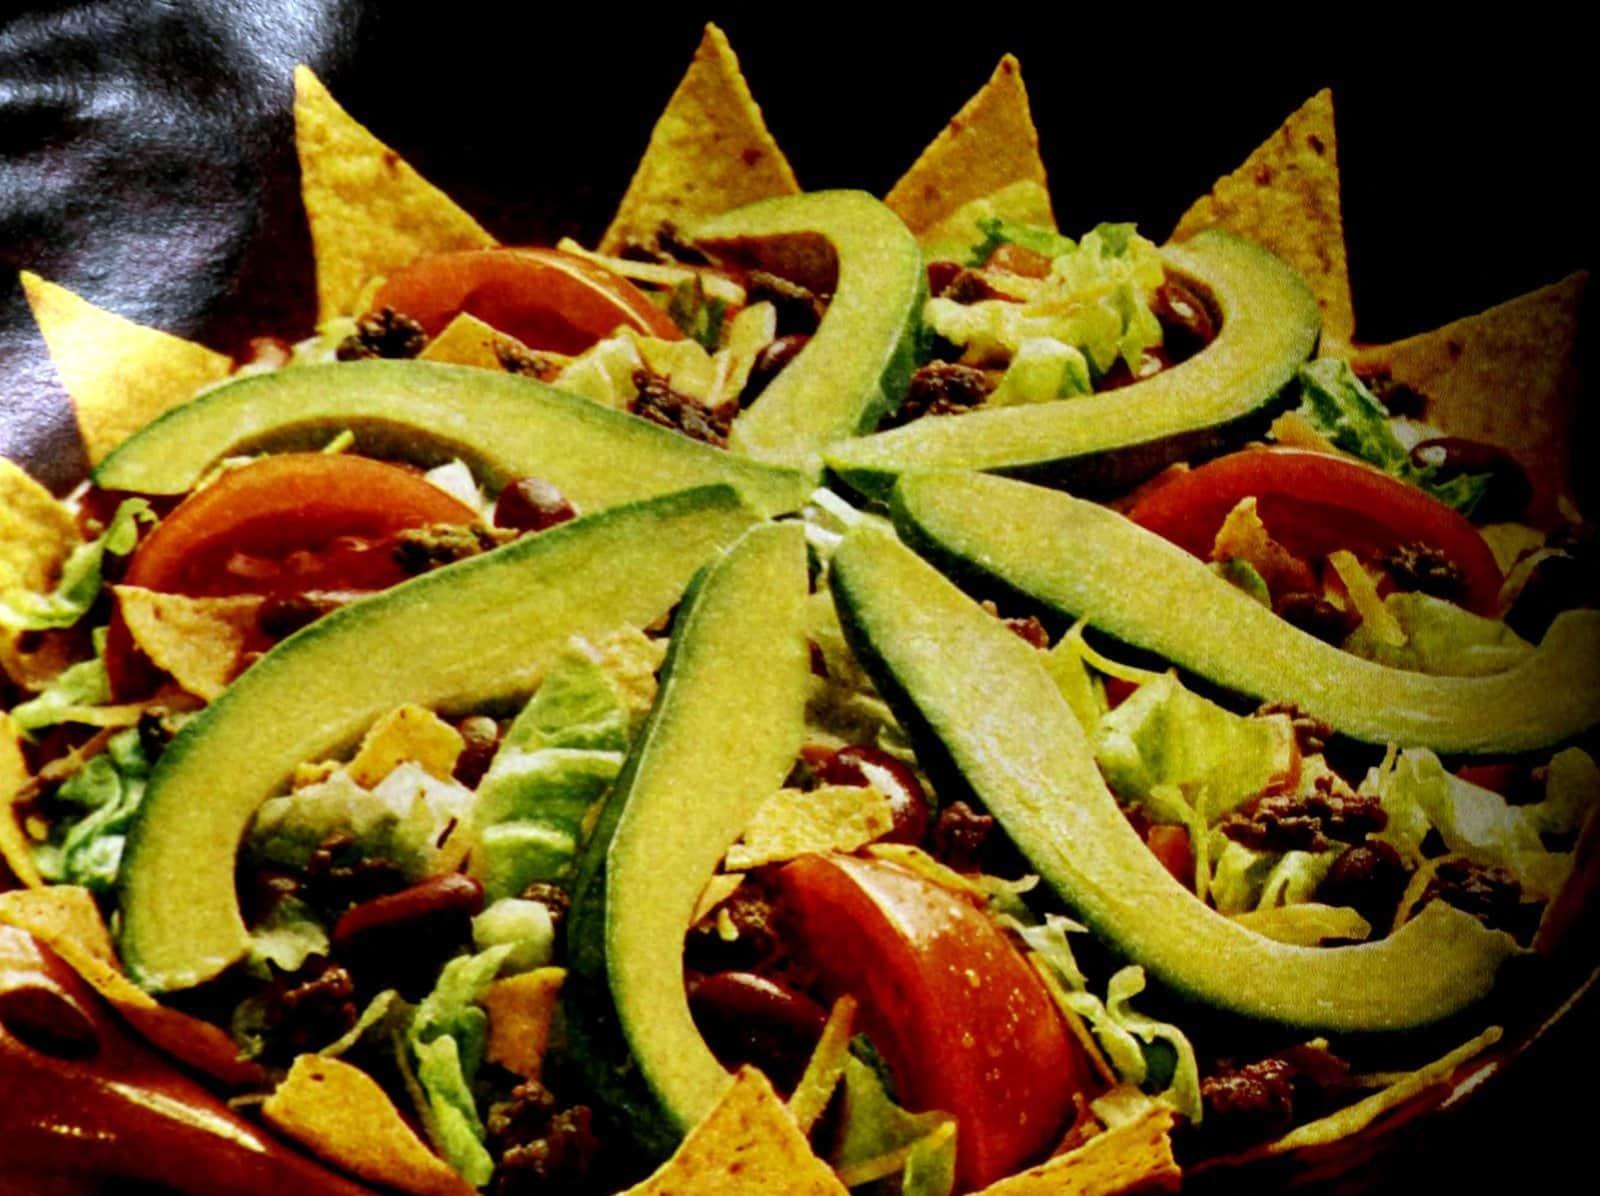 Mexican Chef's salad recipe 1969